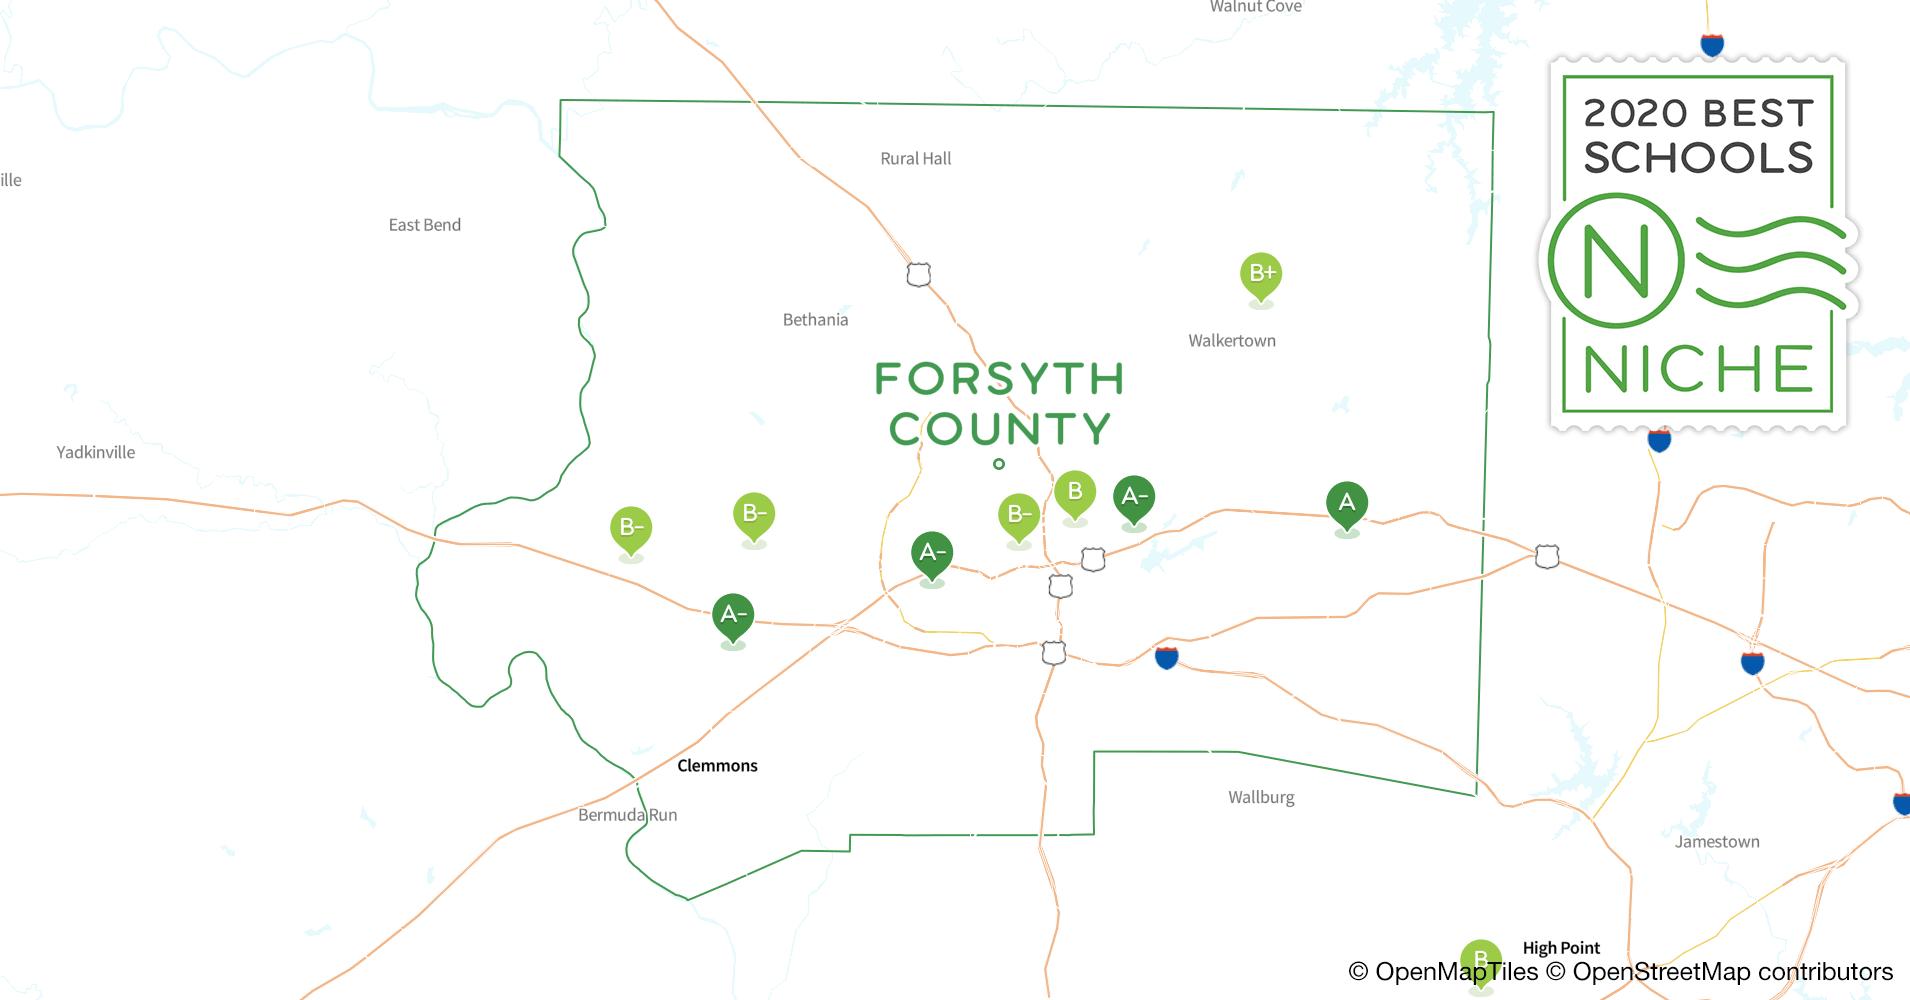 2020 Best Public High Schools in Forsyth County, NC - Niche